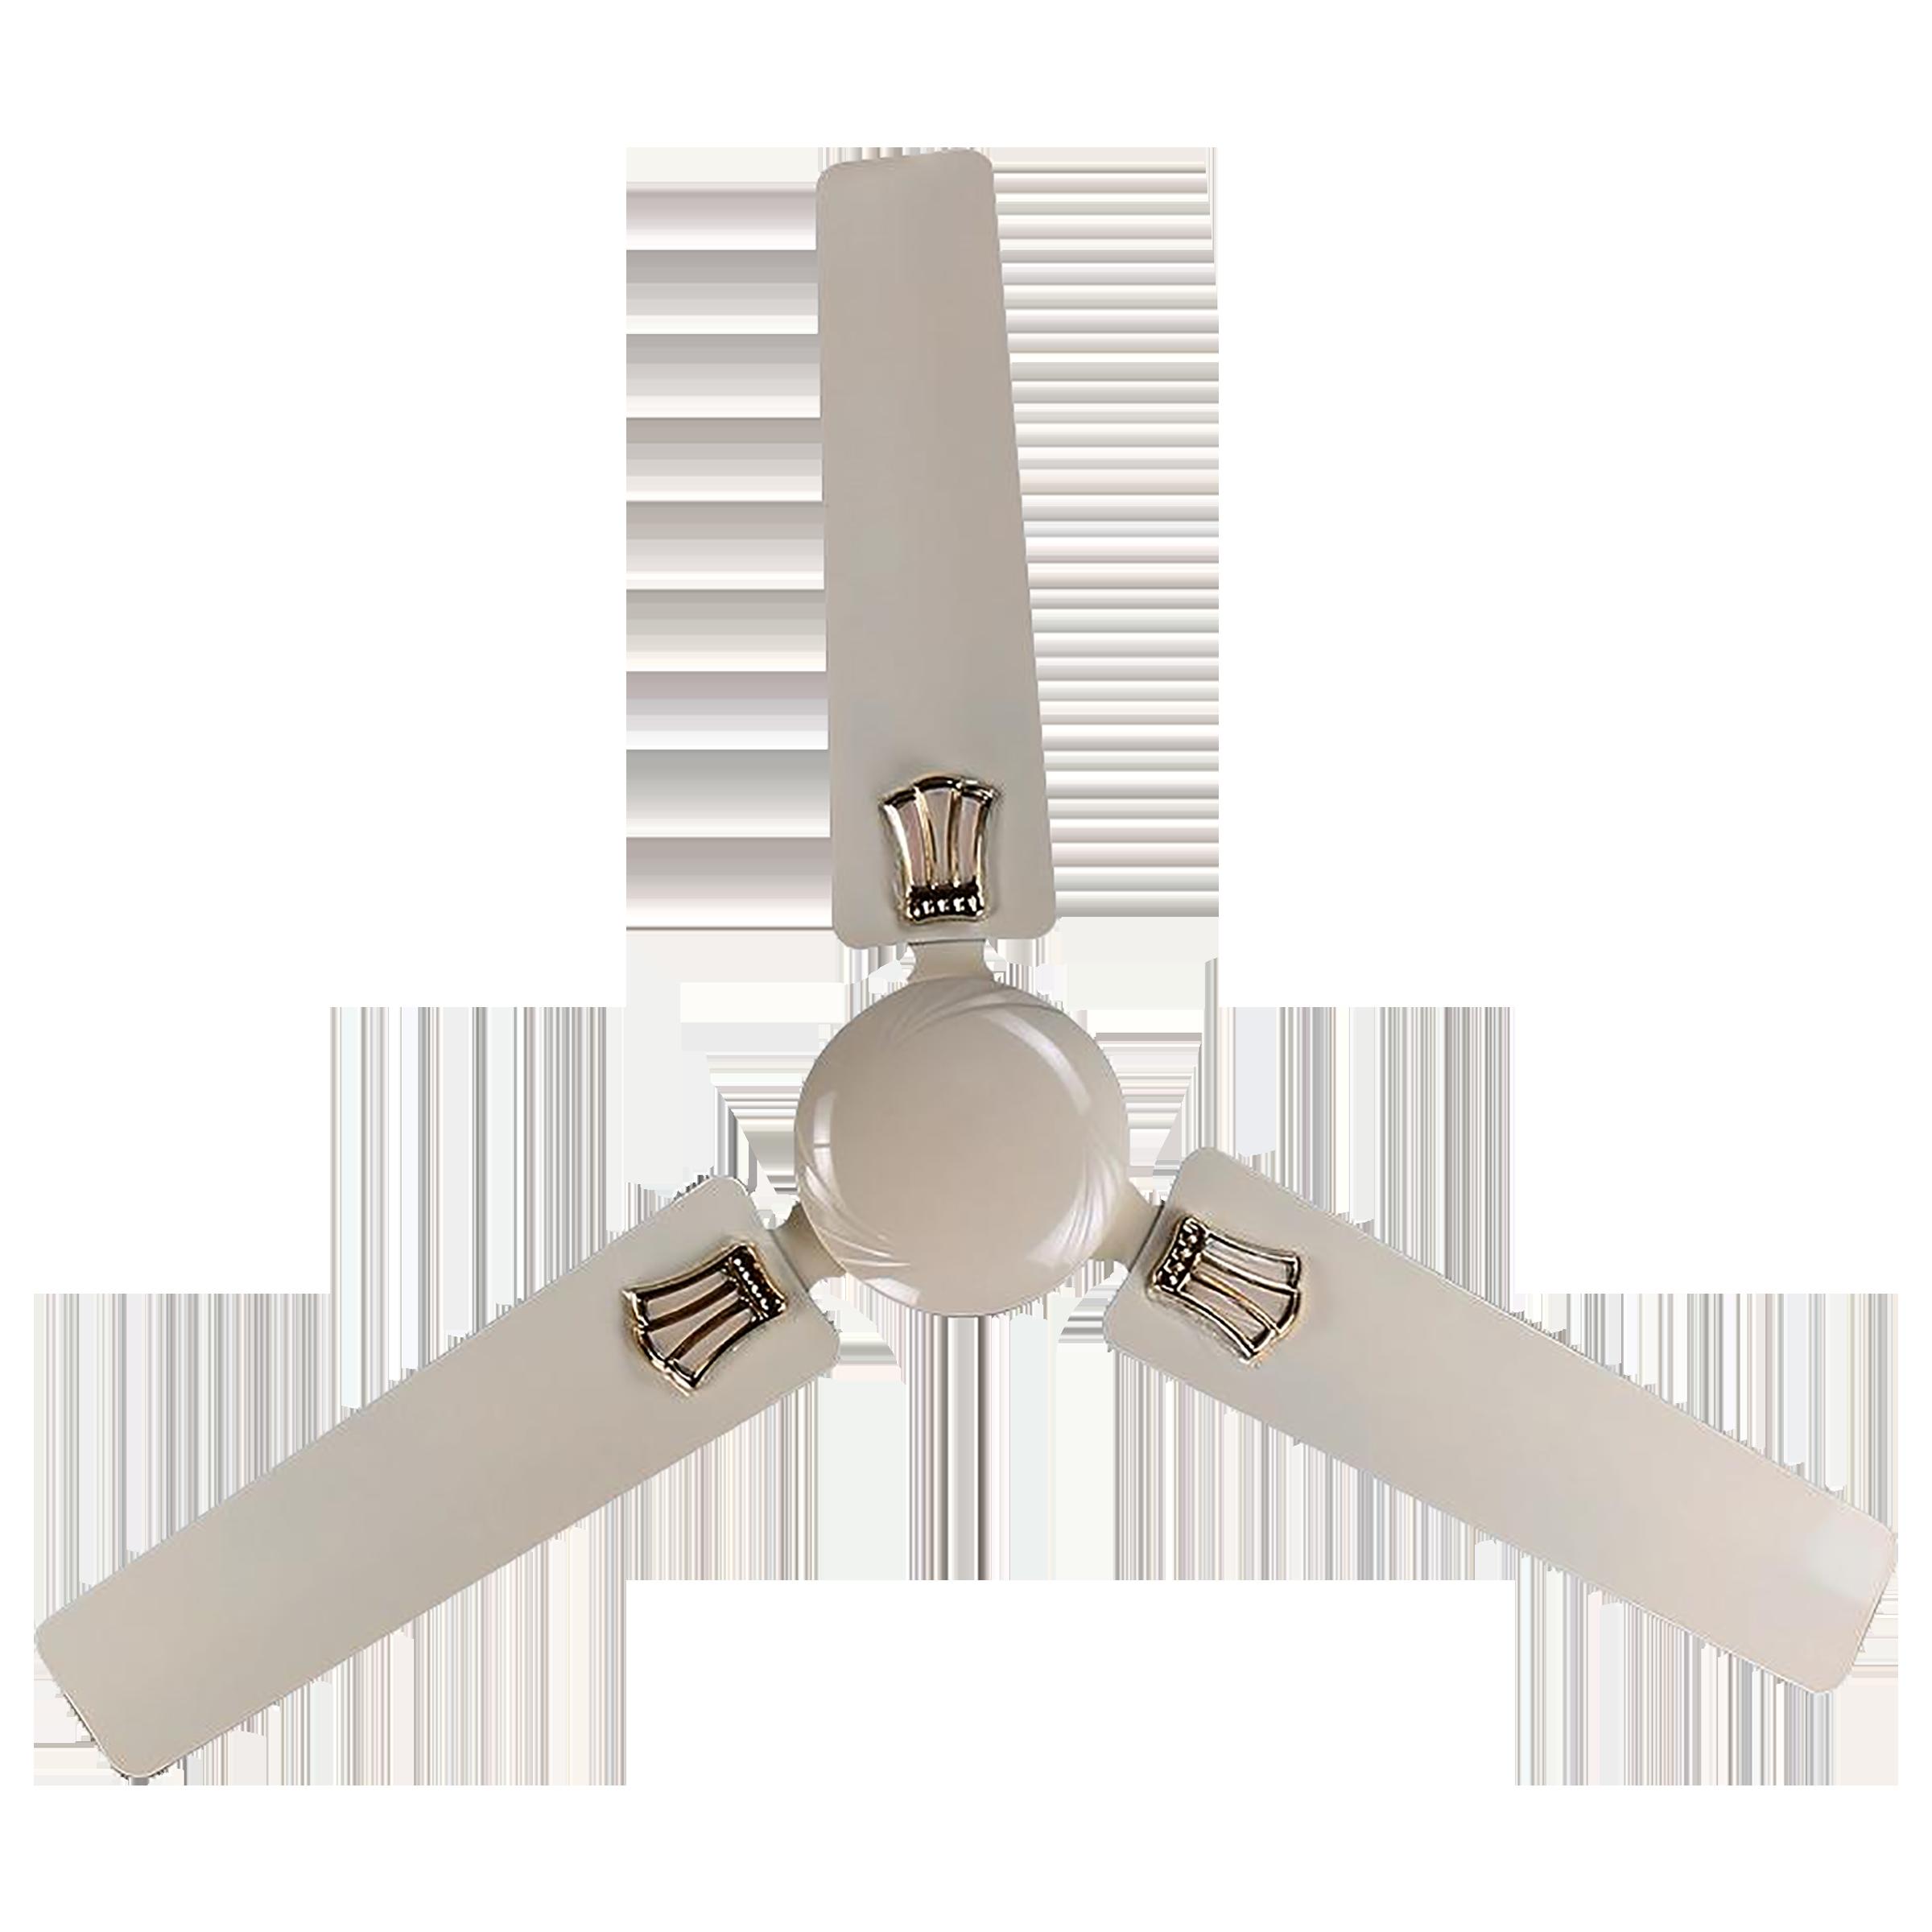 Rico 140 cm Sweep 3 Blade Ceiling Fan (Dust Resistant, CF810, White)_1